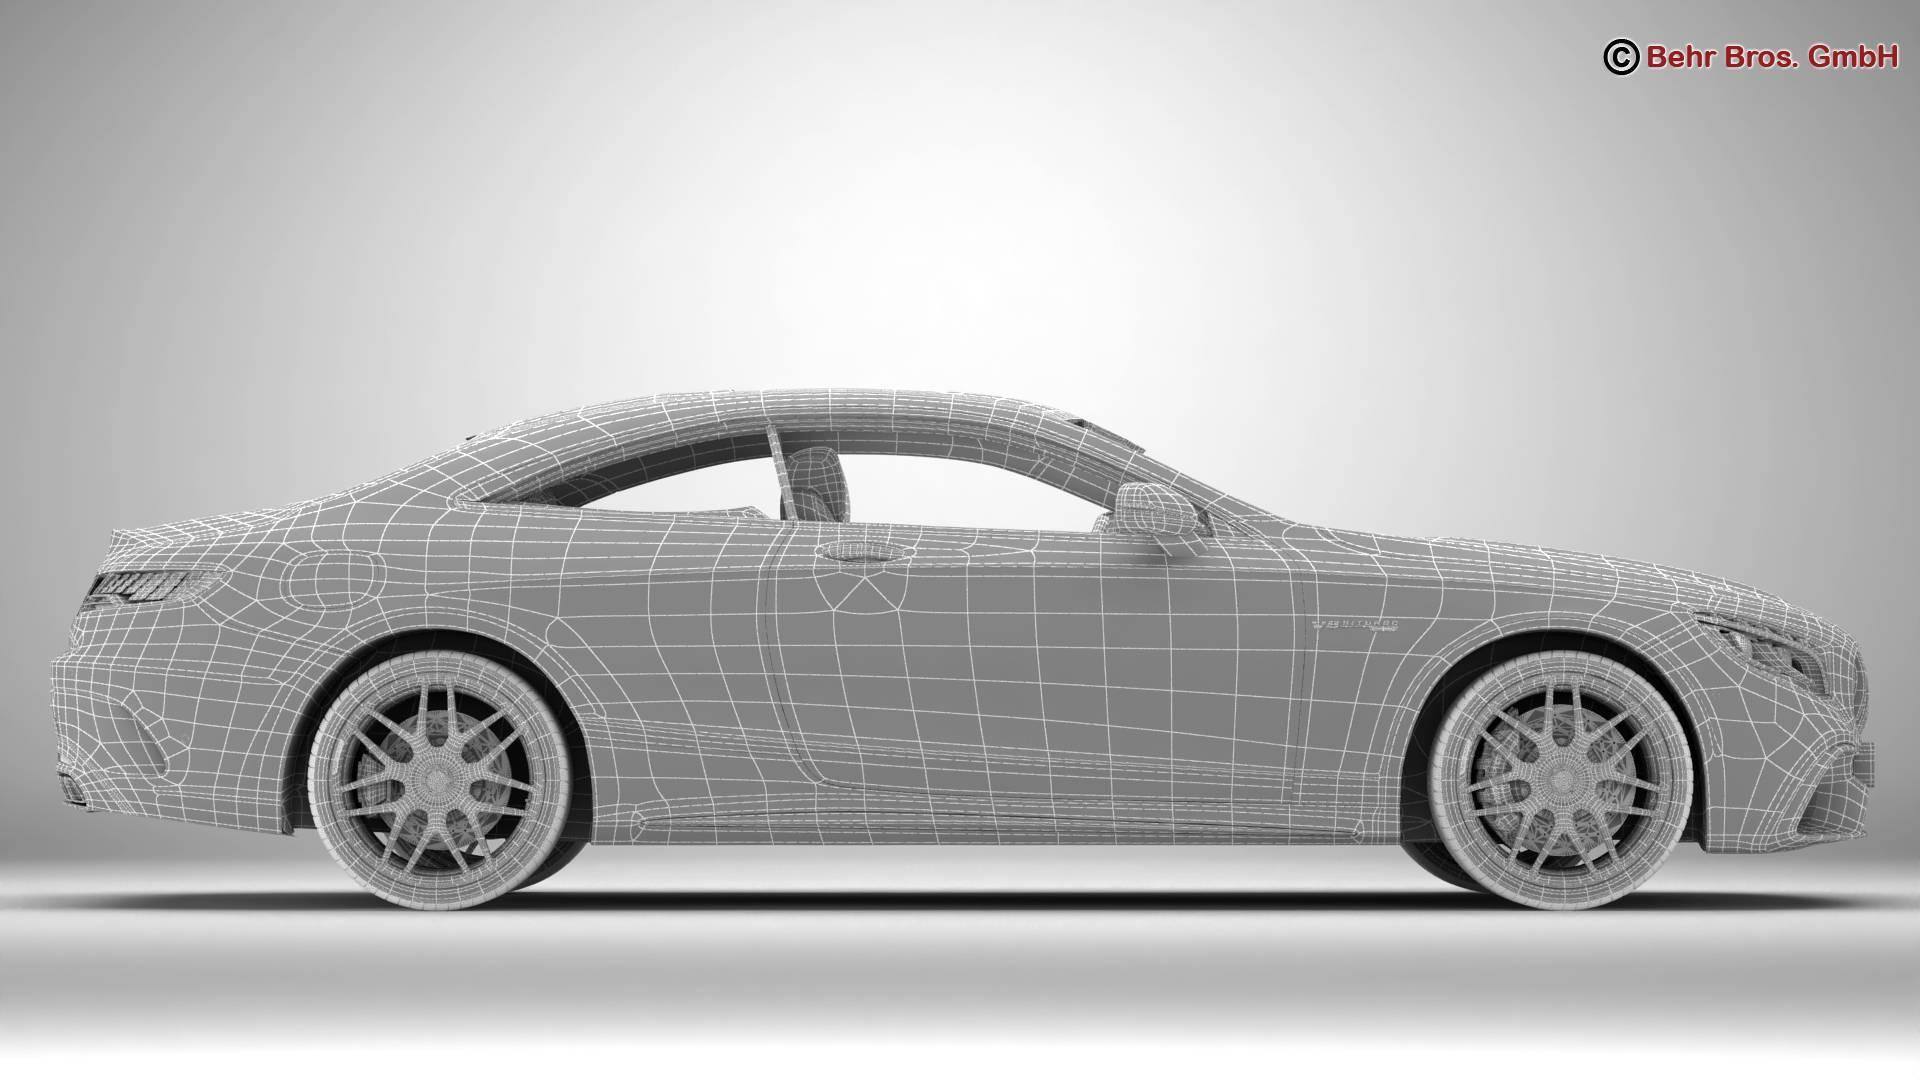 mercedes s class coupe amg s63 2018 3d model 3ds max fbx c4d lwo ma mb obj 274109